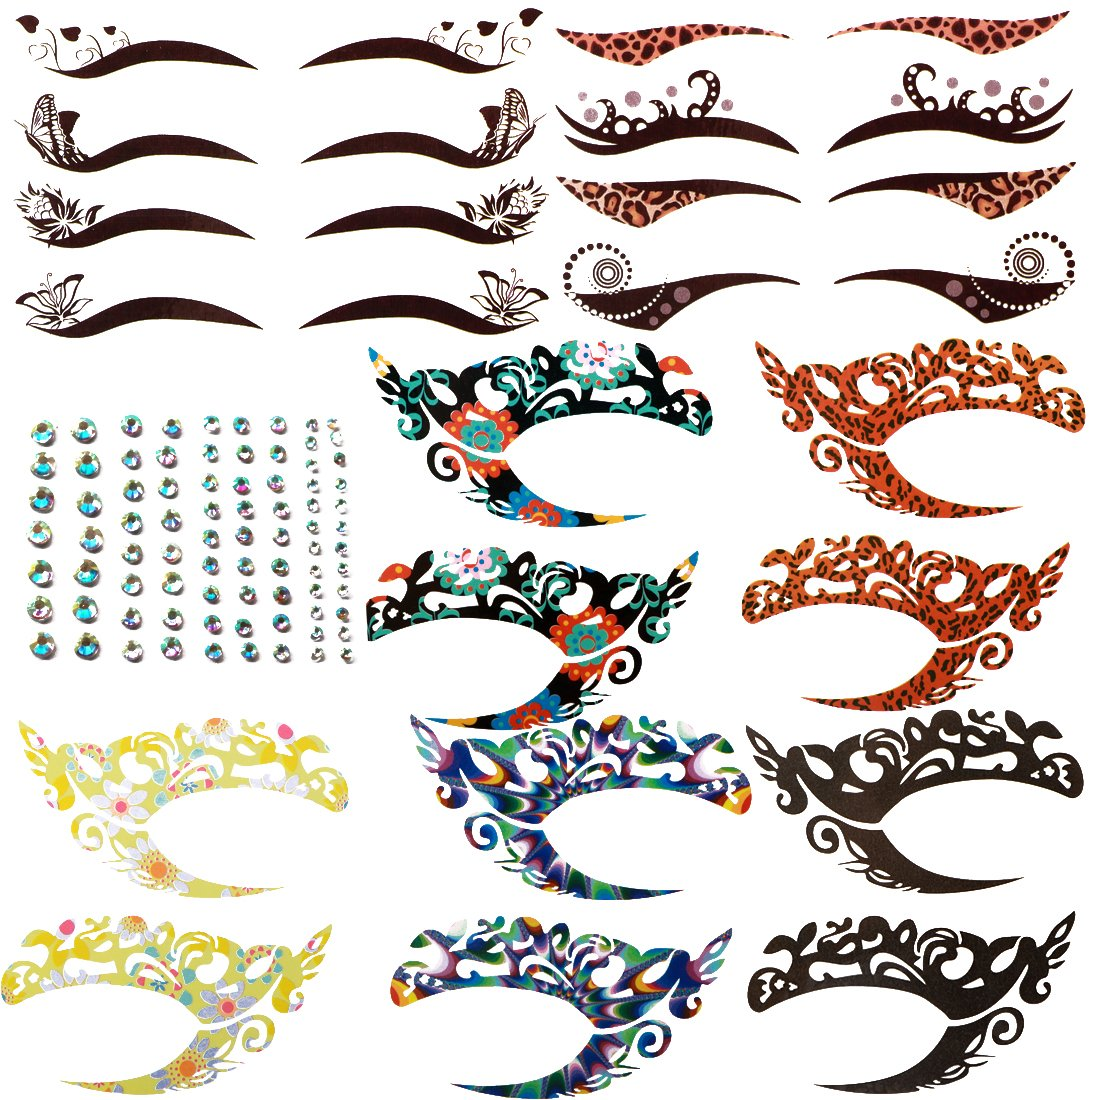 kilofly 8 Sets Temporary Eye Tattoo Makeup Transfer Stickers Crystal Gem Liners